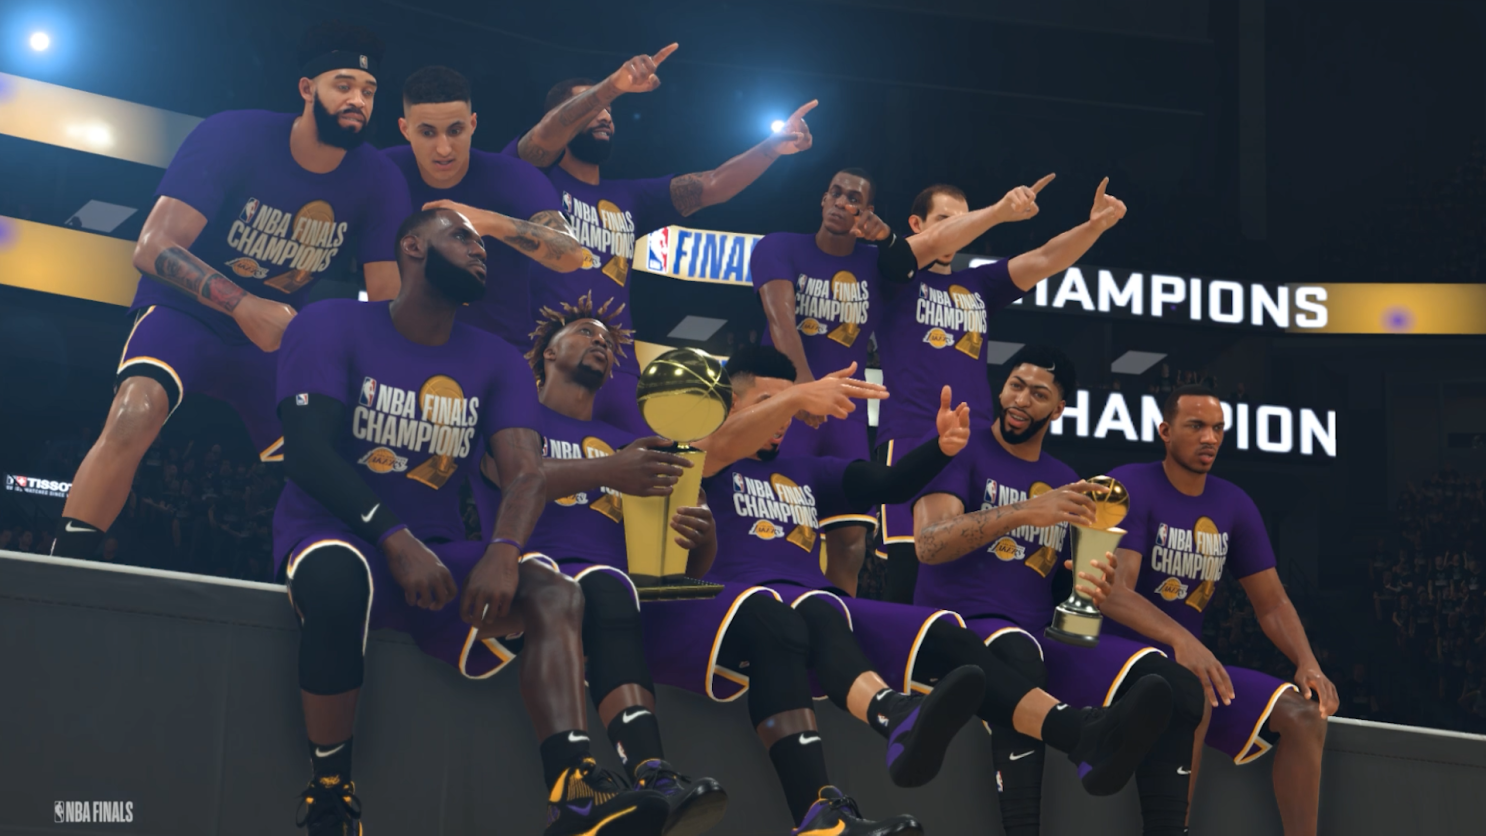 Lakers Beat Bucks For 2020 Title In Nba 2k Season Simulation Los Angeles Times